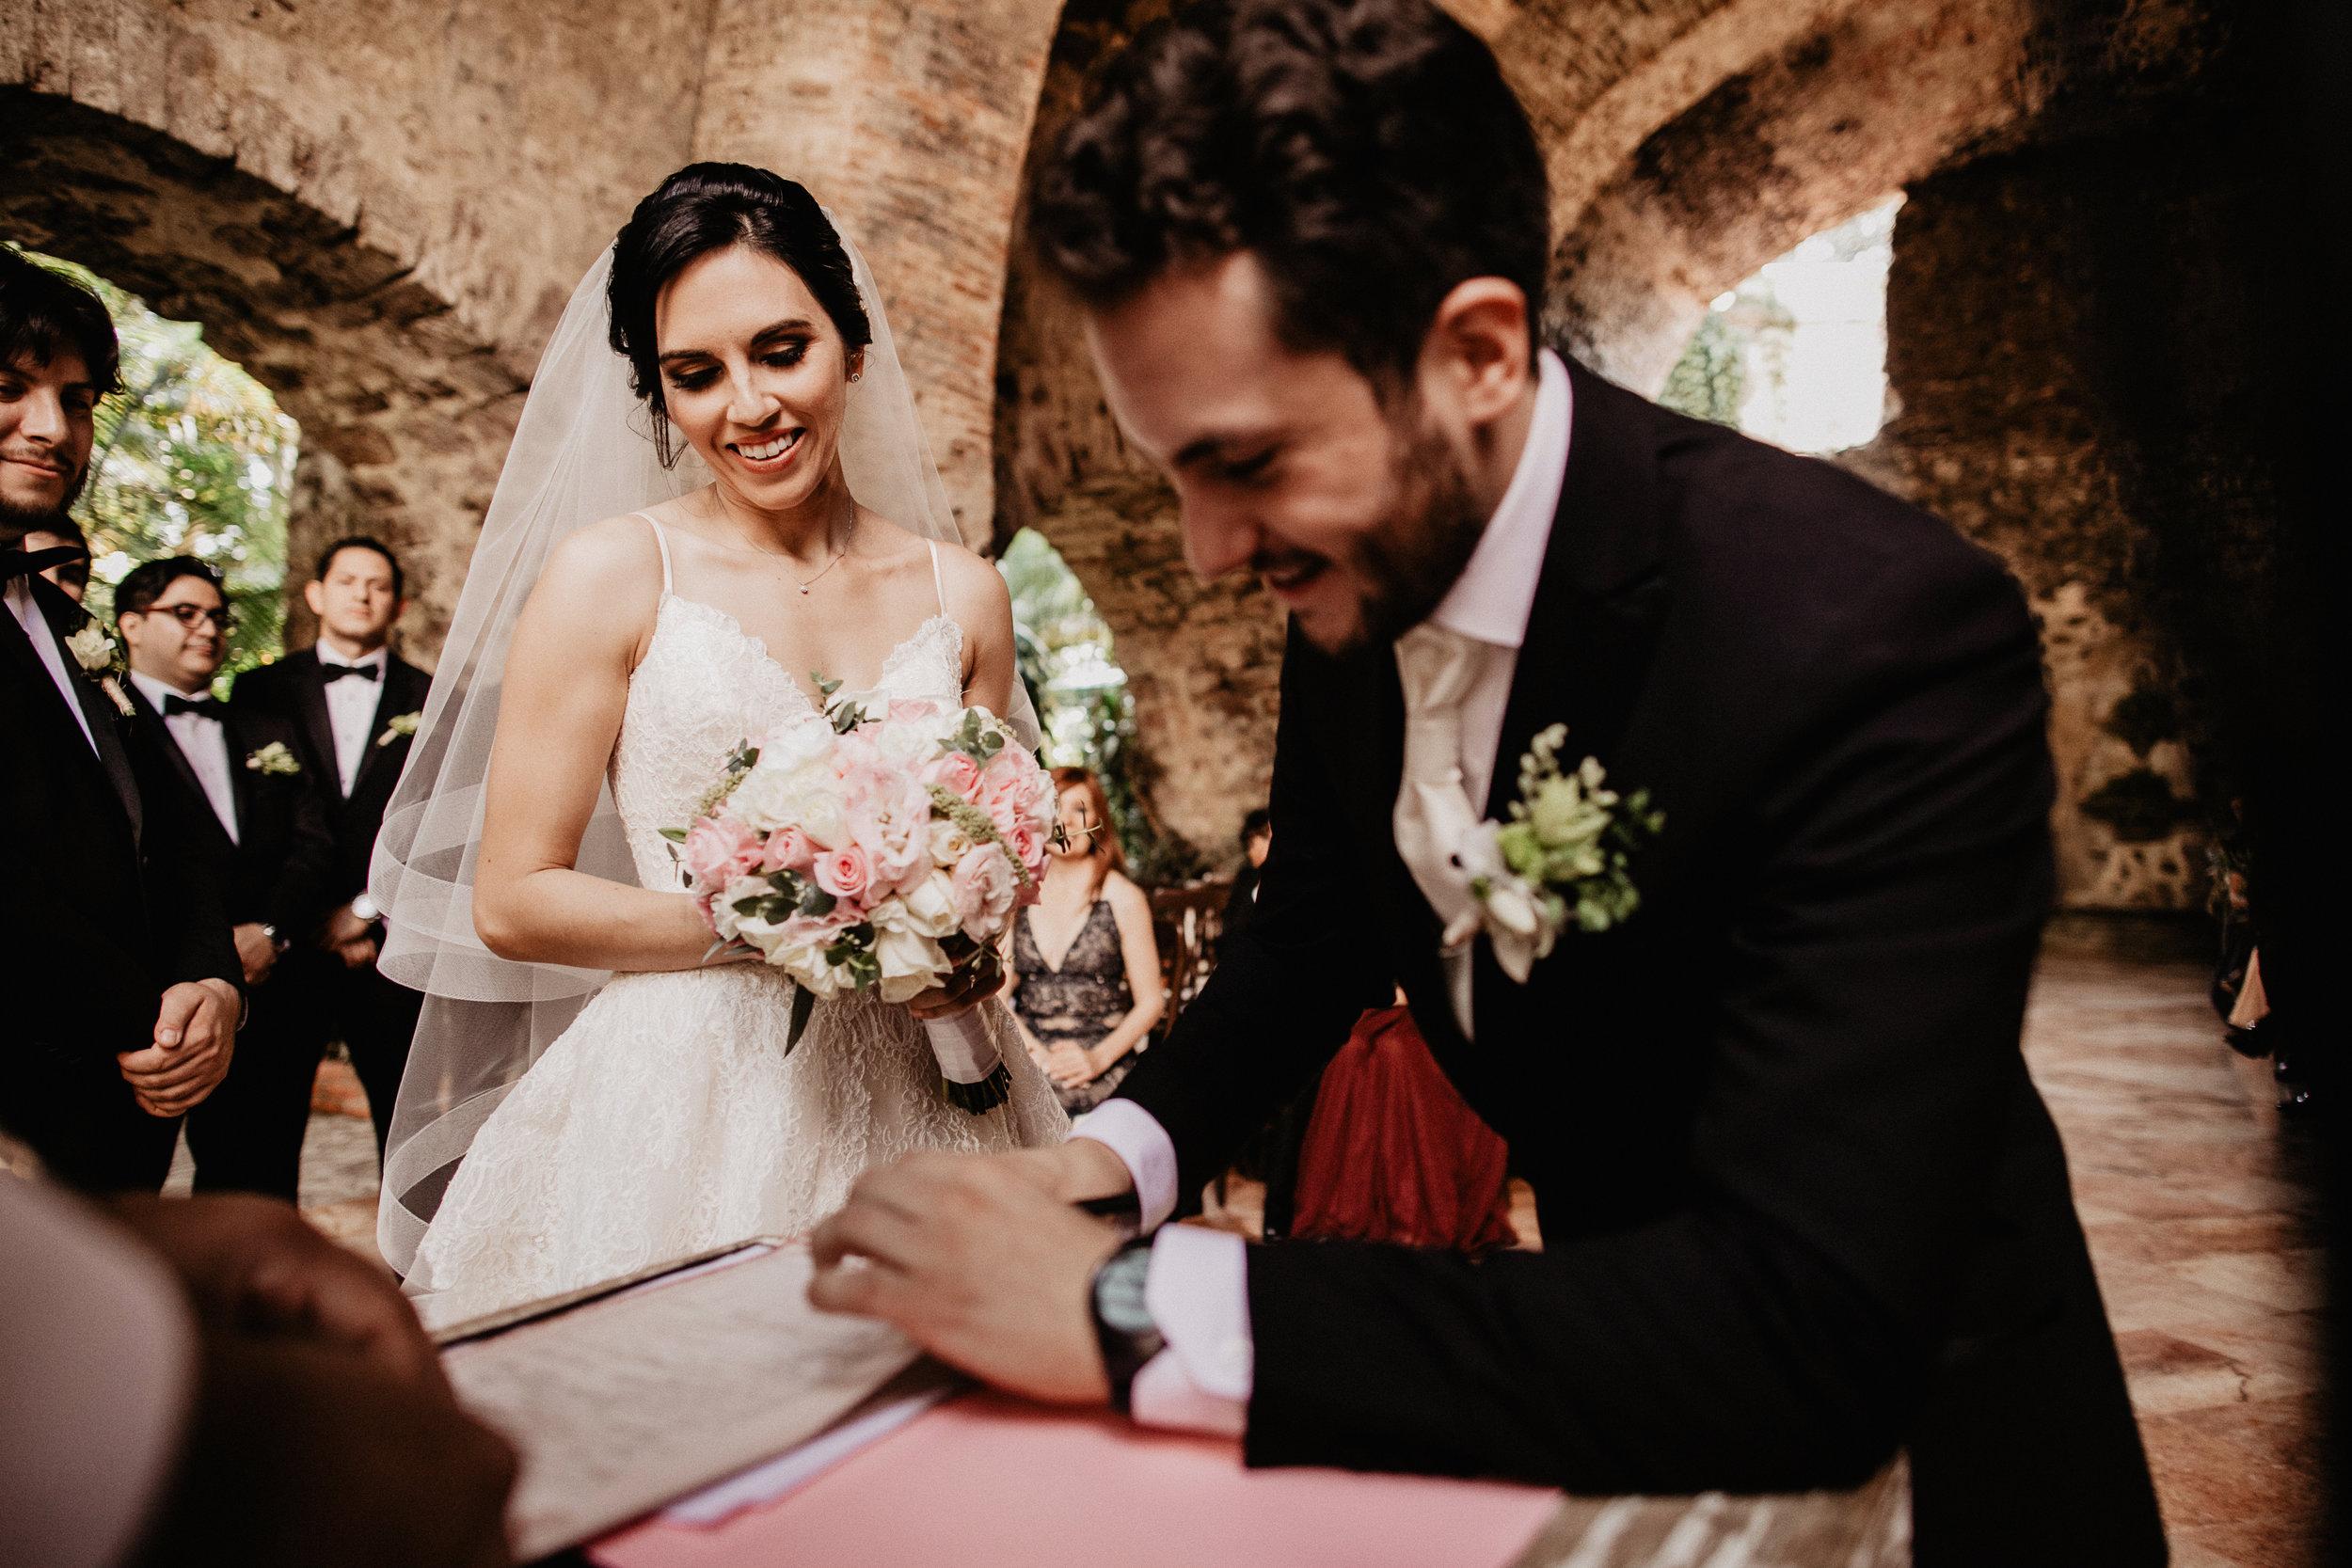 Alfonso_flores_destination_wedding_photography_vanesa_carlos-482.JPG